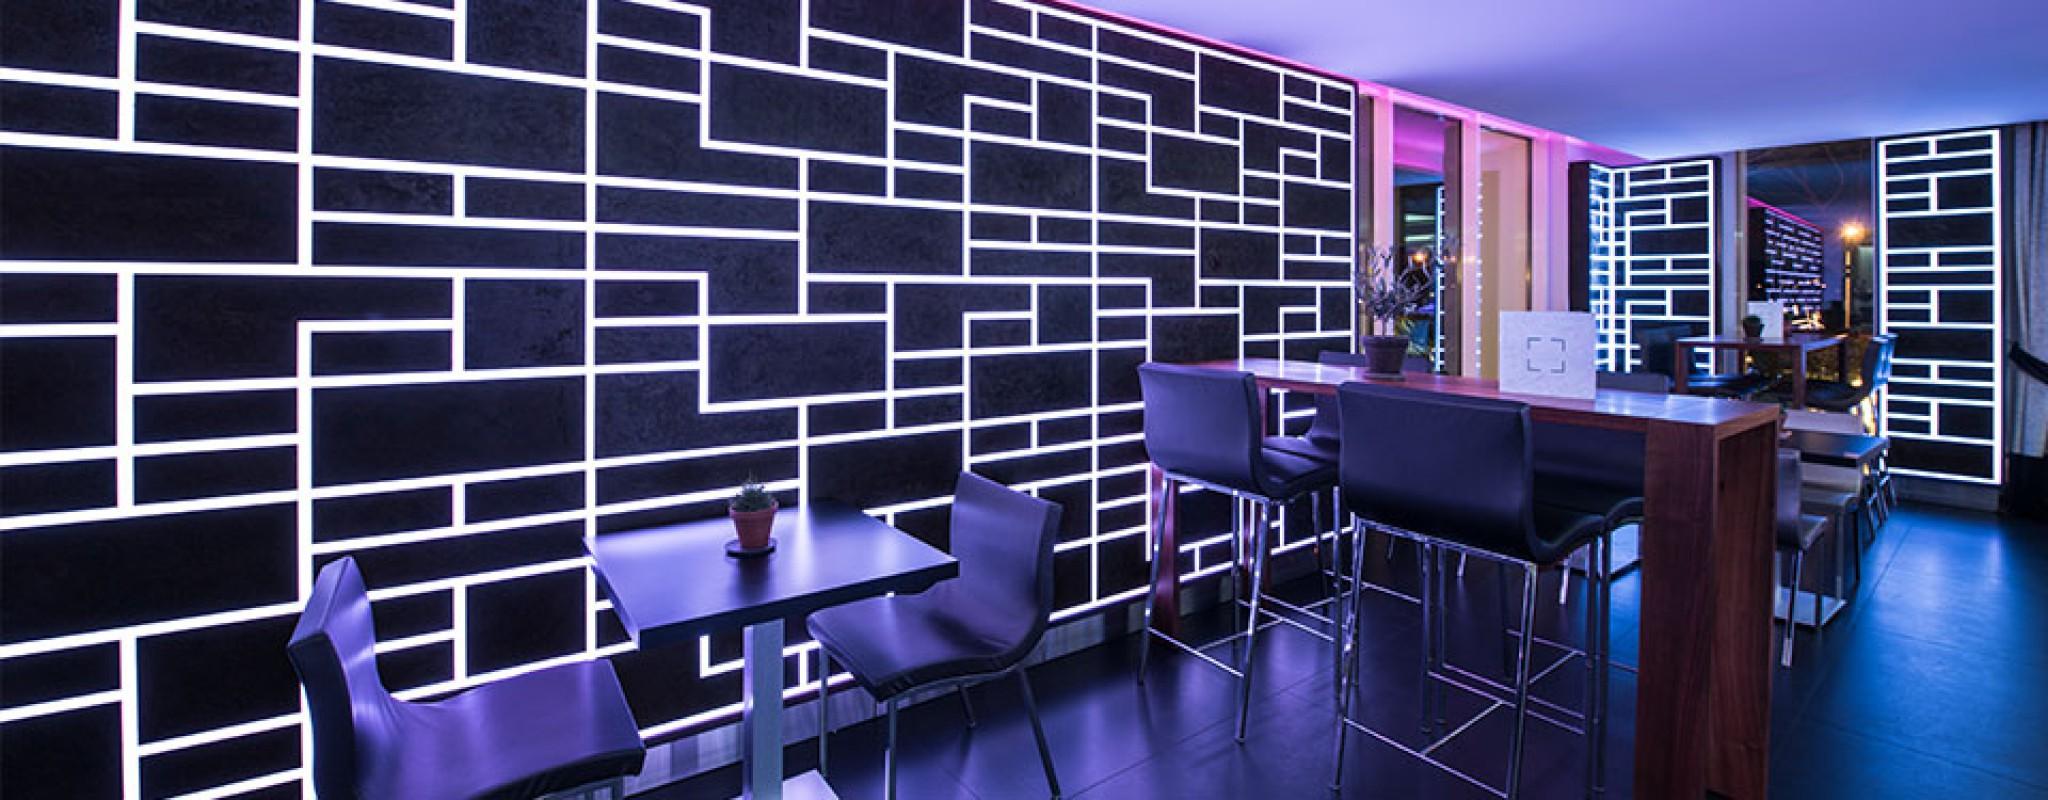 Strip Led Piu Luminosi strisce led e barre luminose, per un'atmosfera speciale